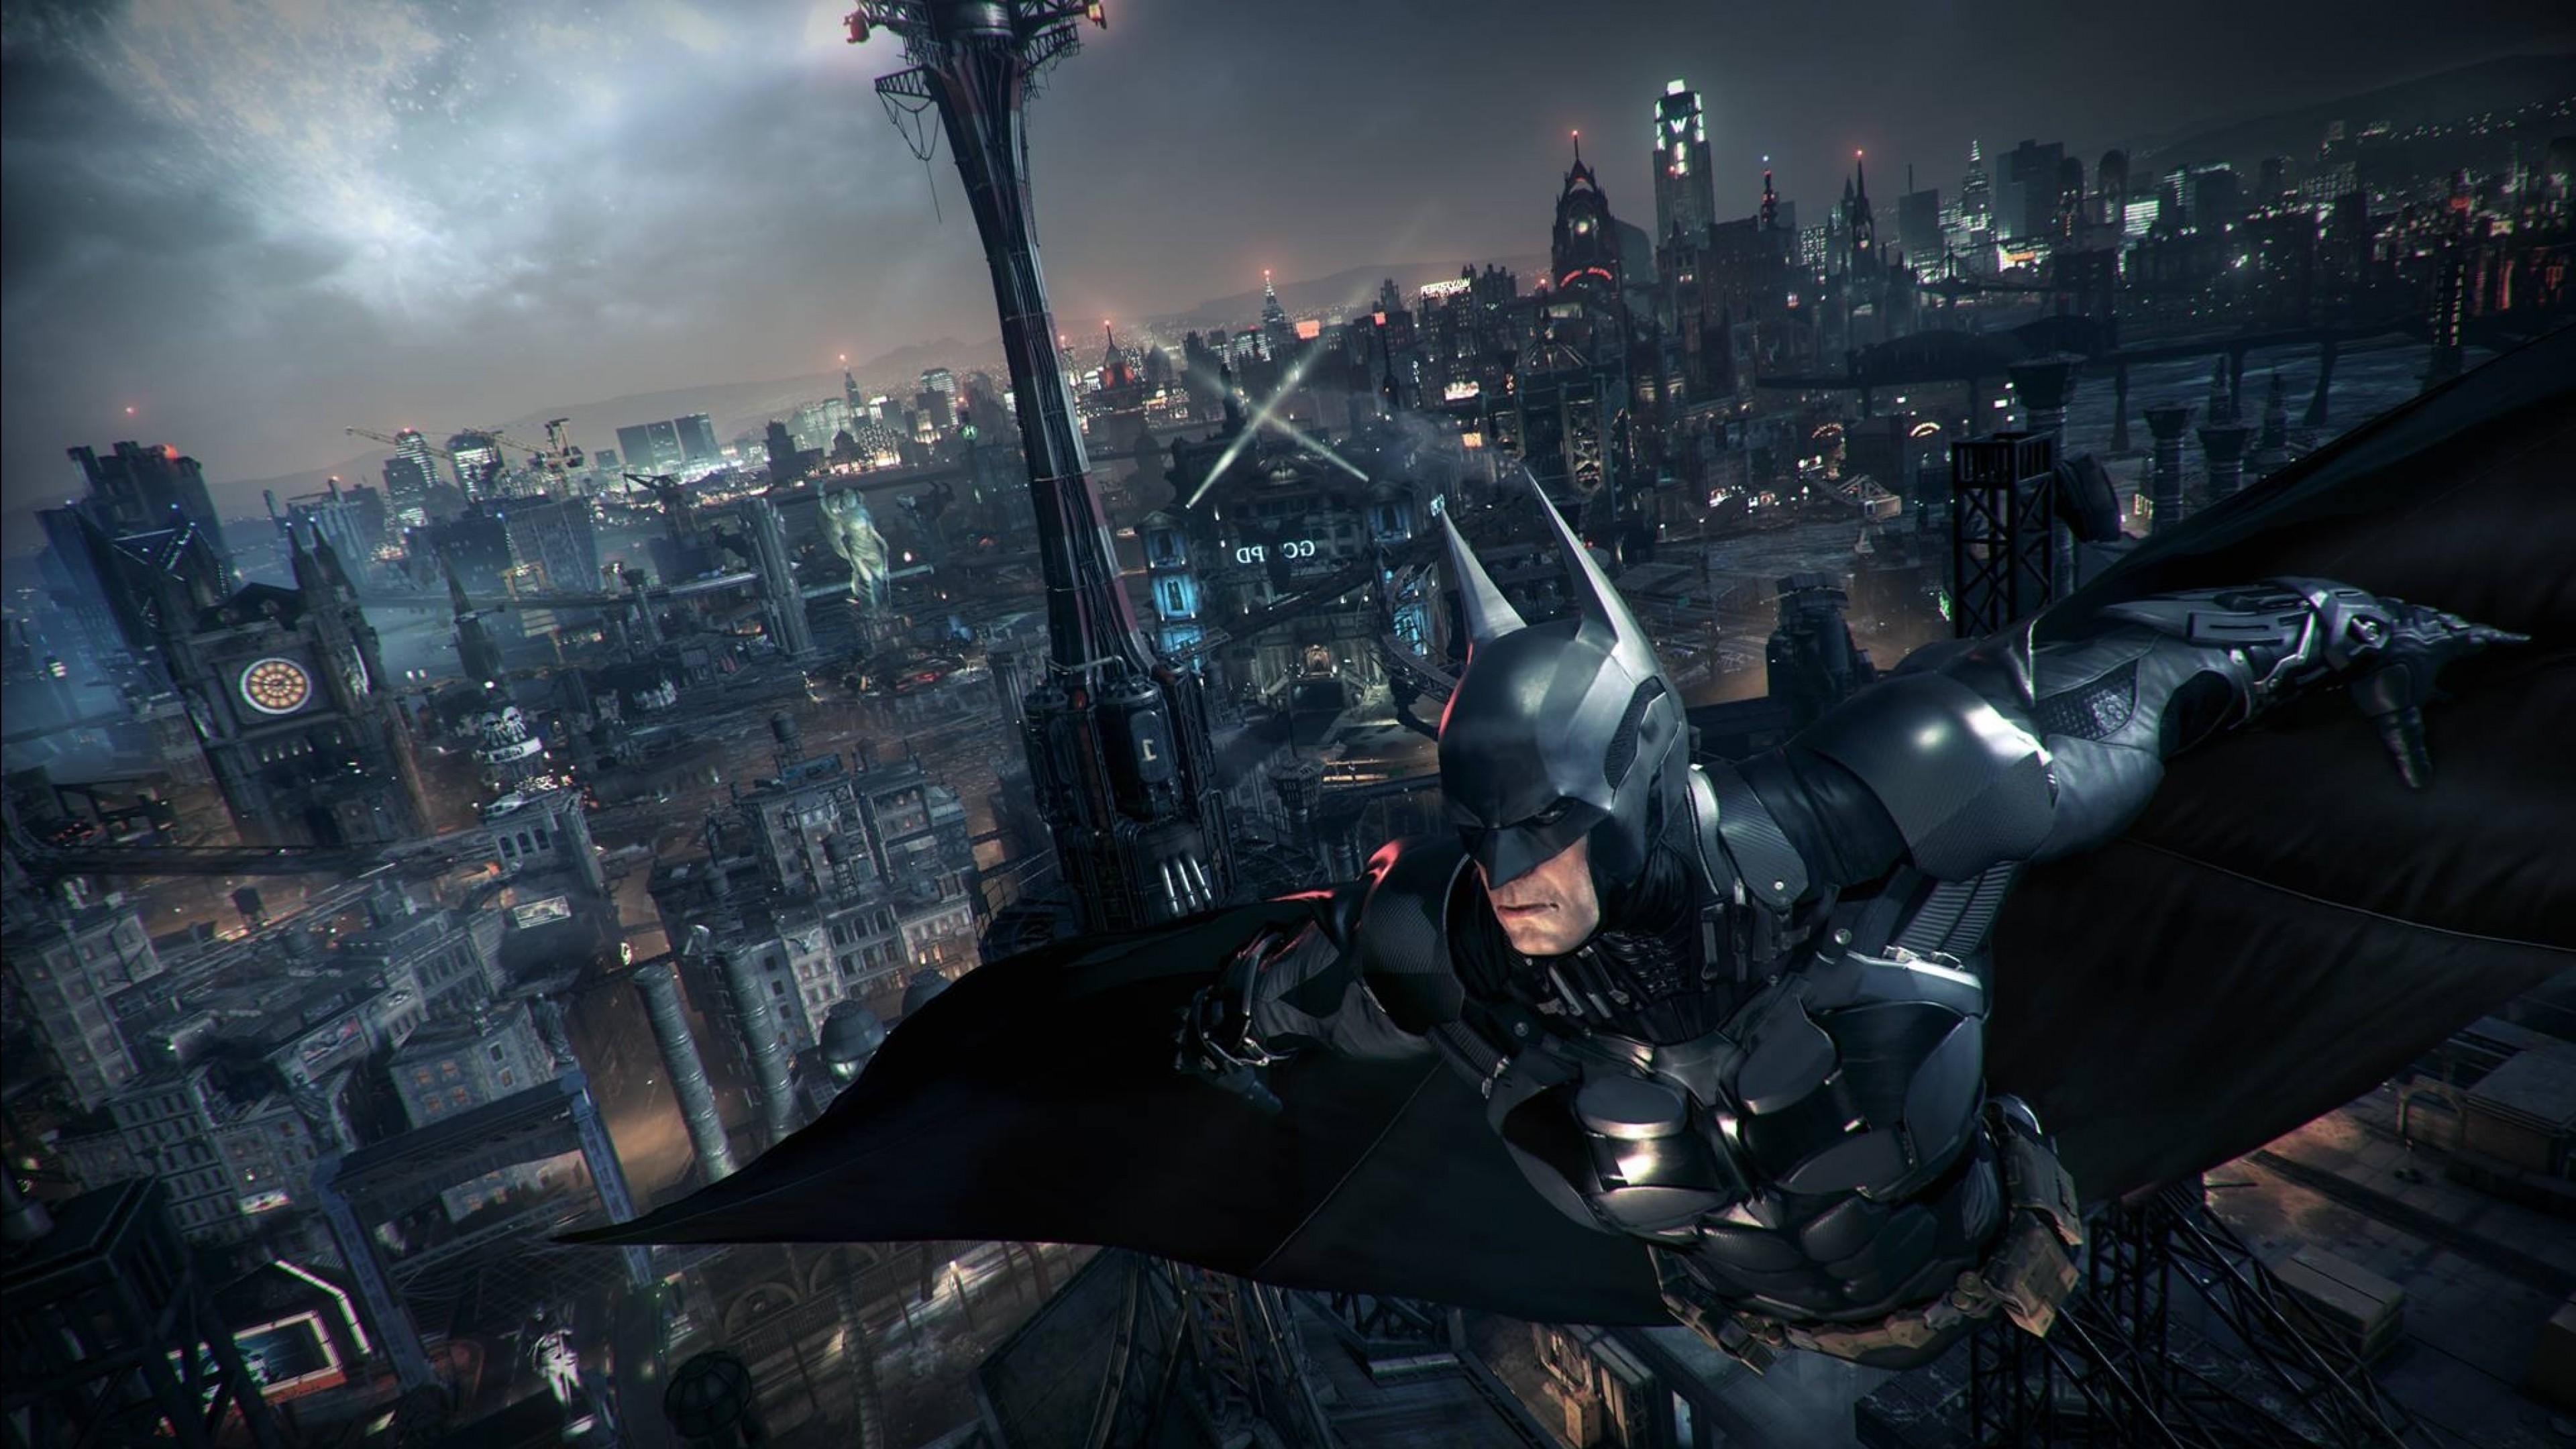 Wallpaper video games batman arkham knight rocksteady for Batman arkham knight wallpaper 1920x1080